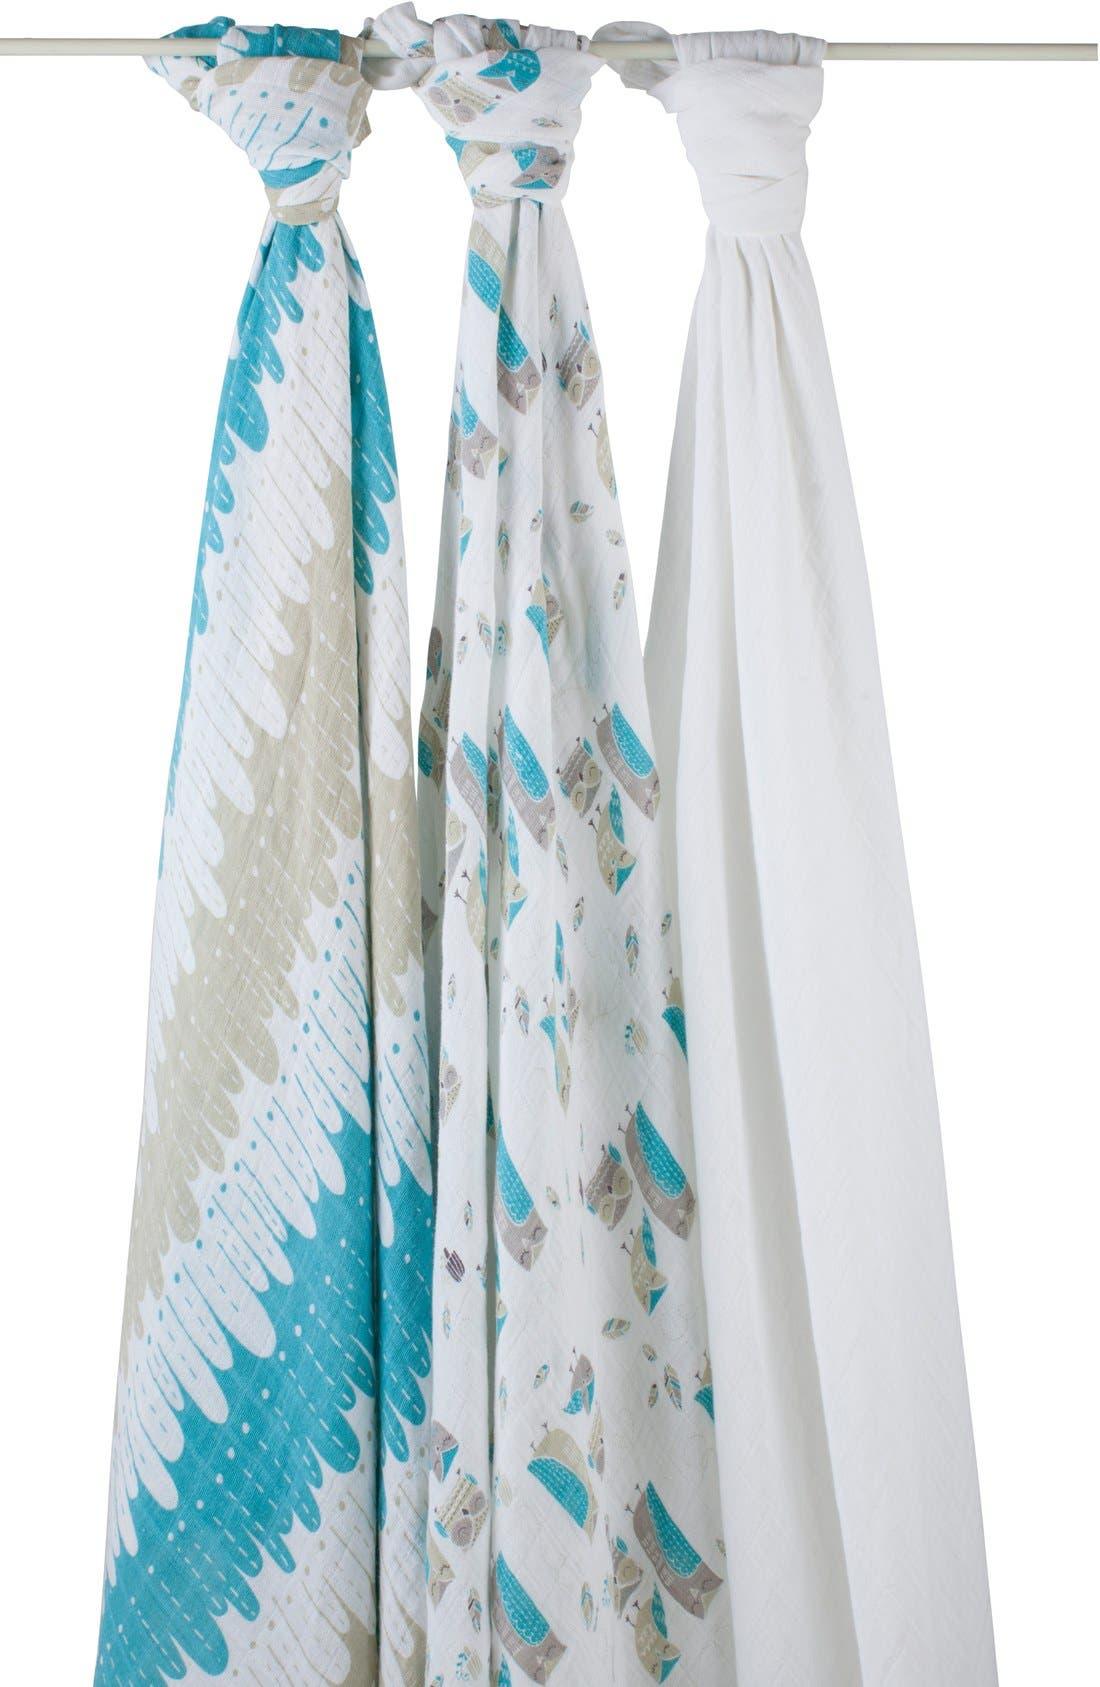 Main Image - aden + anais Organic Swaddling Cloths (3-Pack)